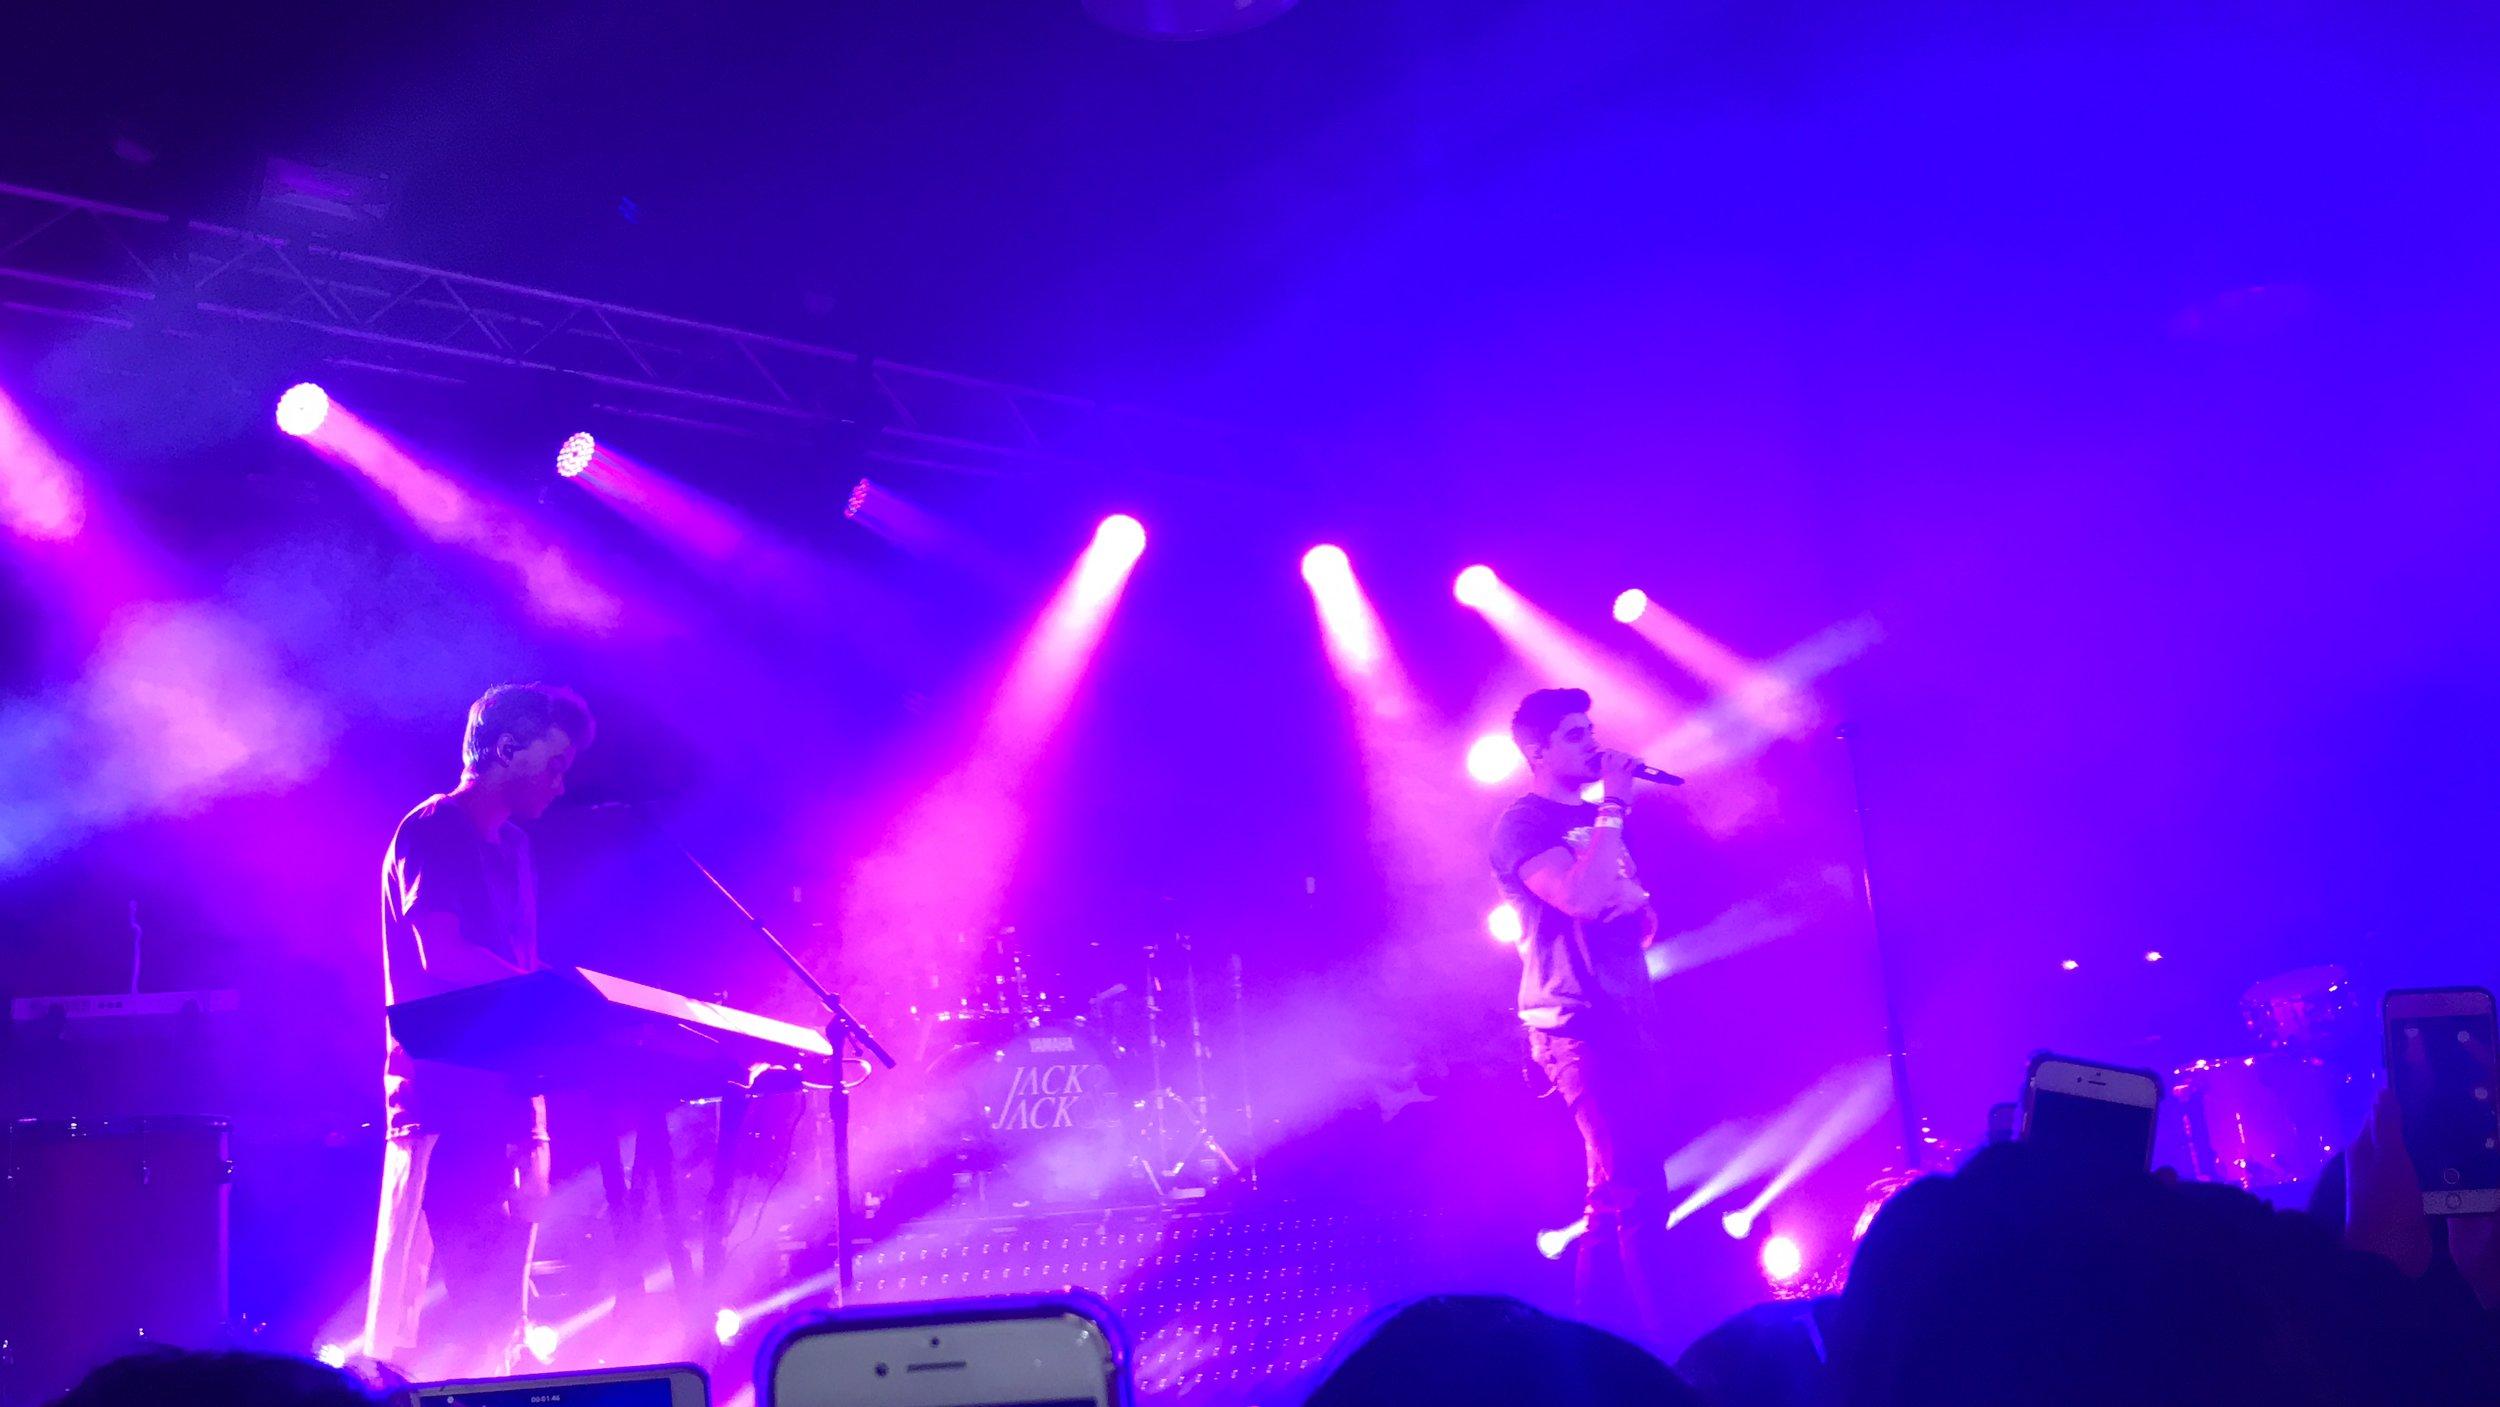 Jack & Jack Concert- Photo by me